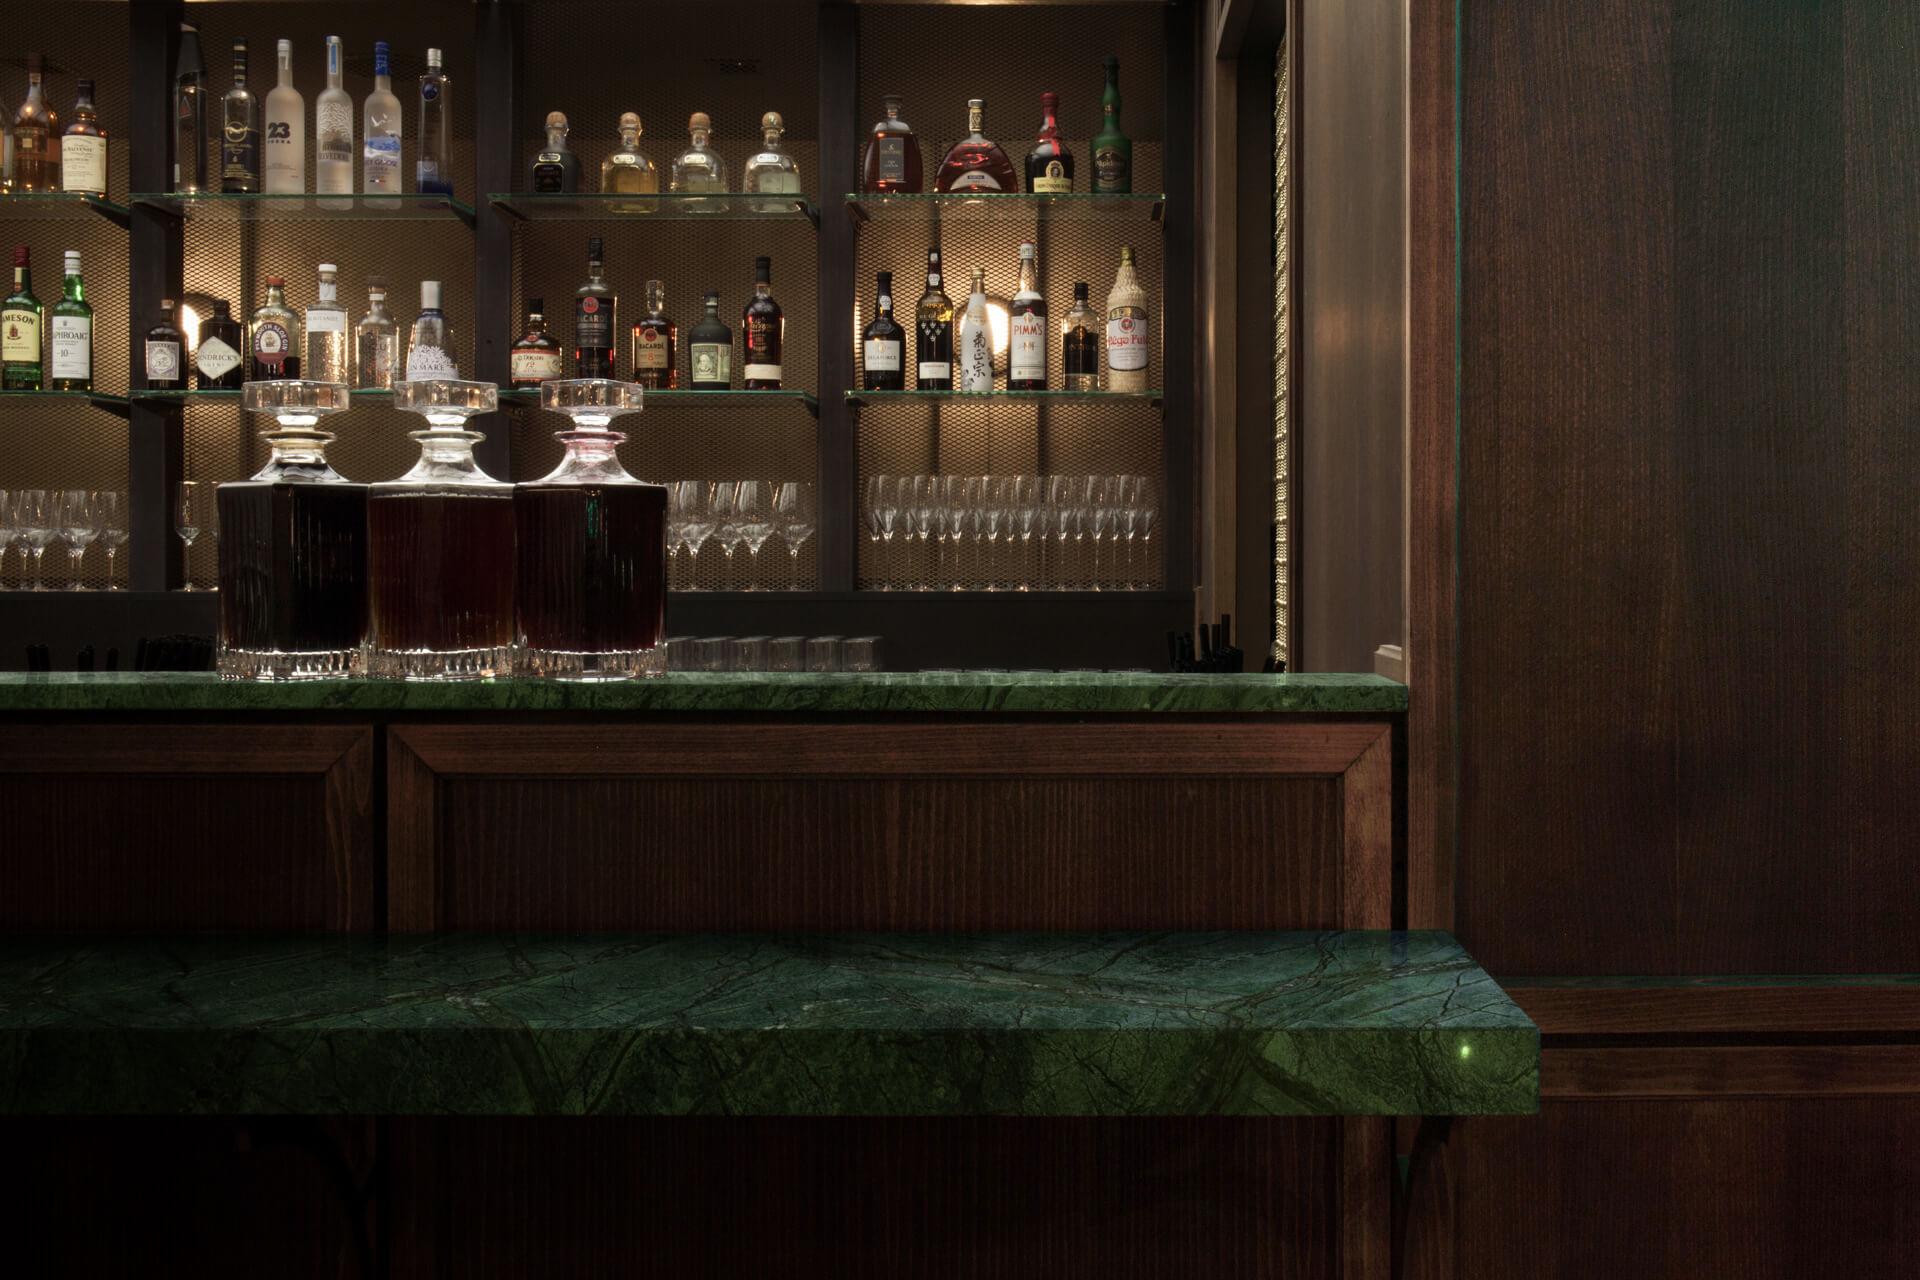 10_LIUC_TinnappelMetz_Restaurant_073_pt 1